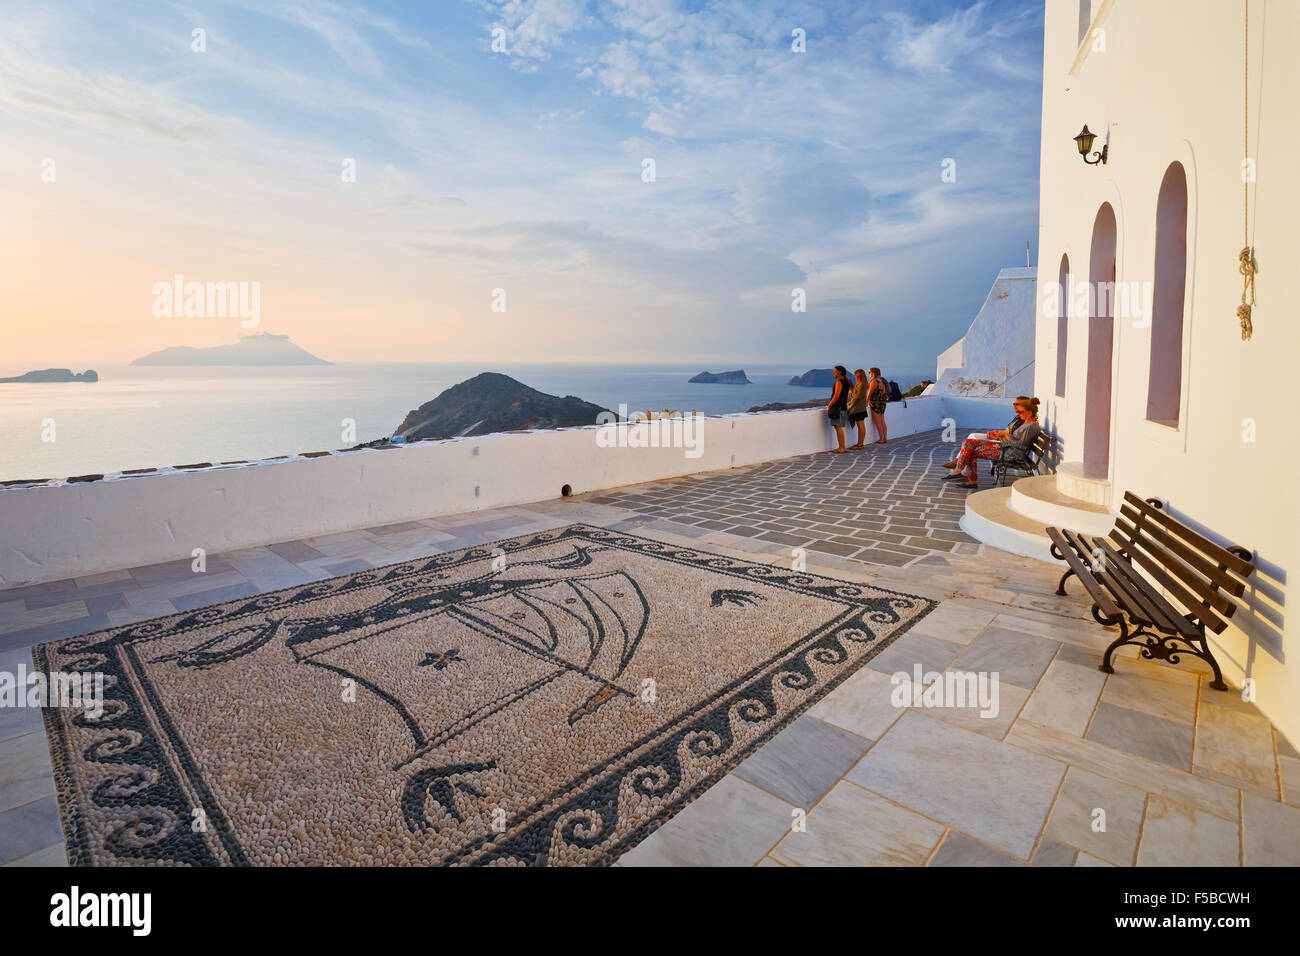 People sitting on a bench in Plaka village on Milos island, Greece - Stock Image